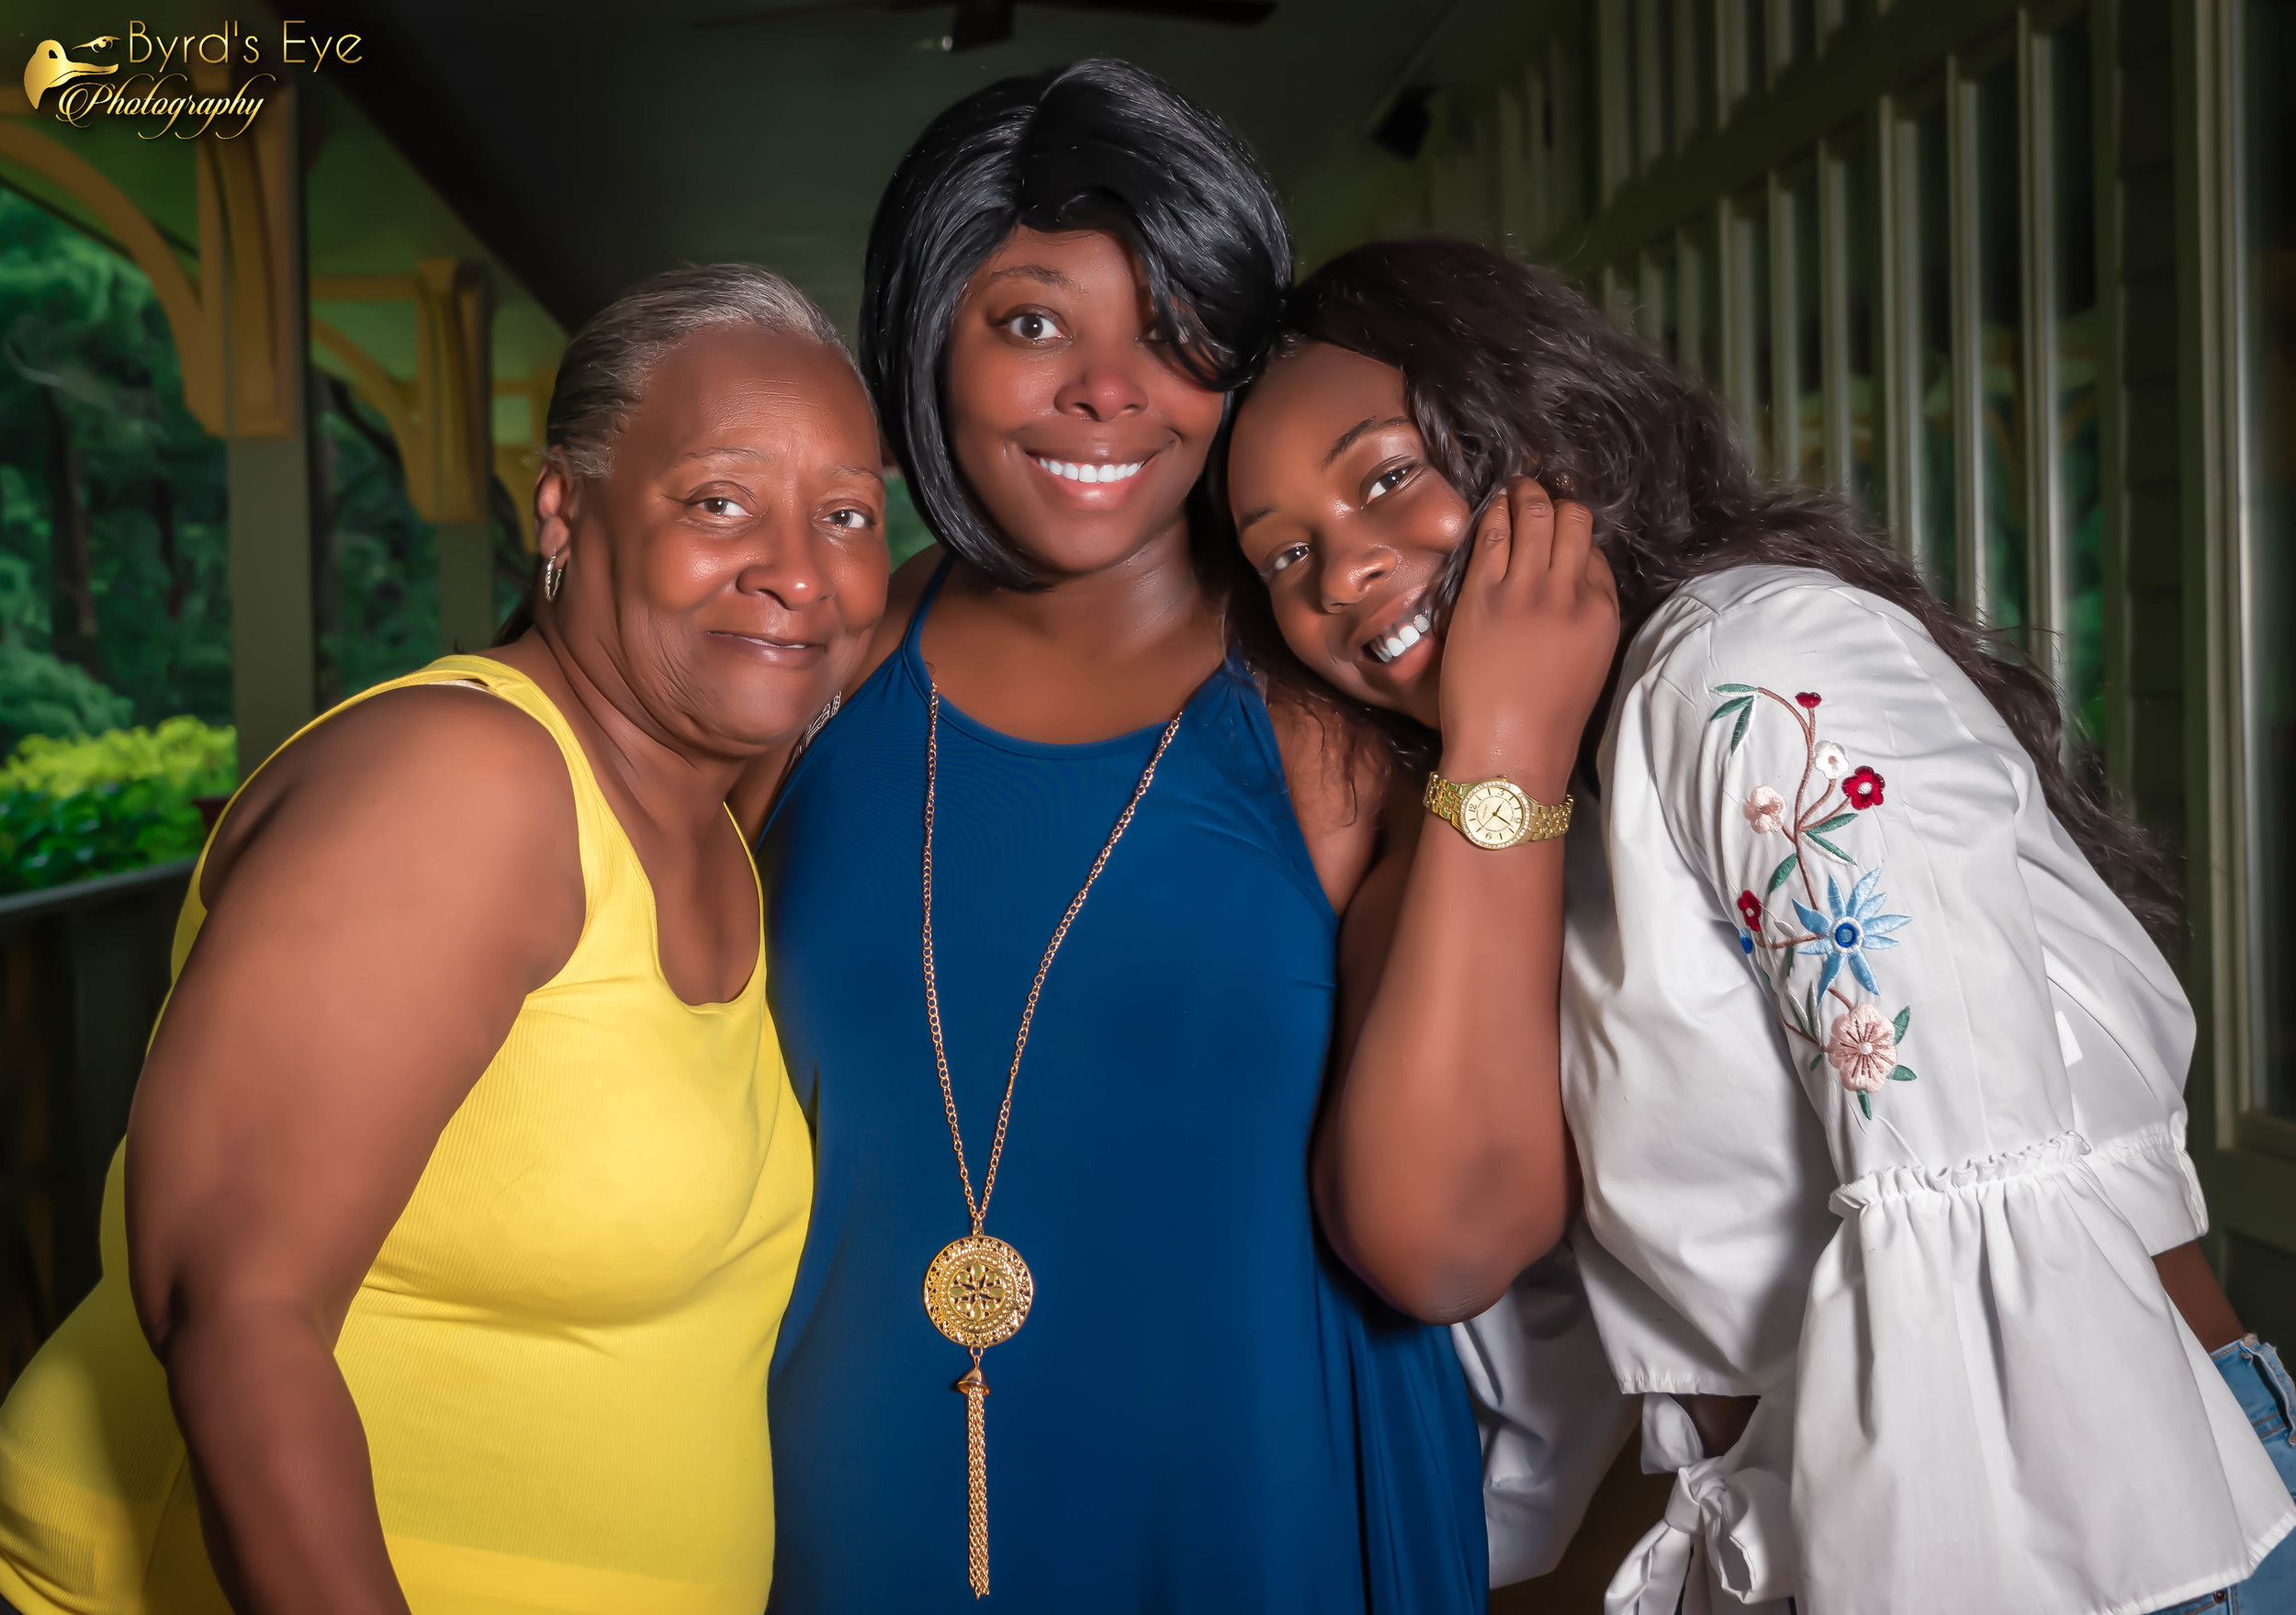 Professional Family Photographer| Spartanburg South Carolina| Byrds Eye Photography